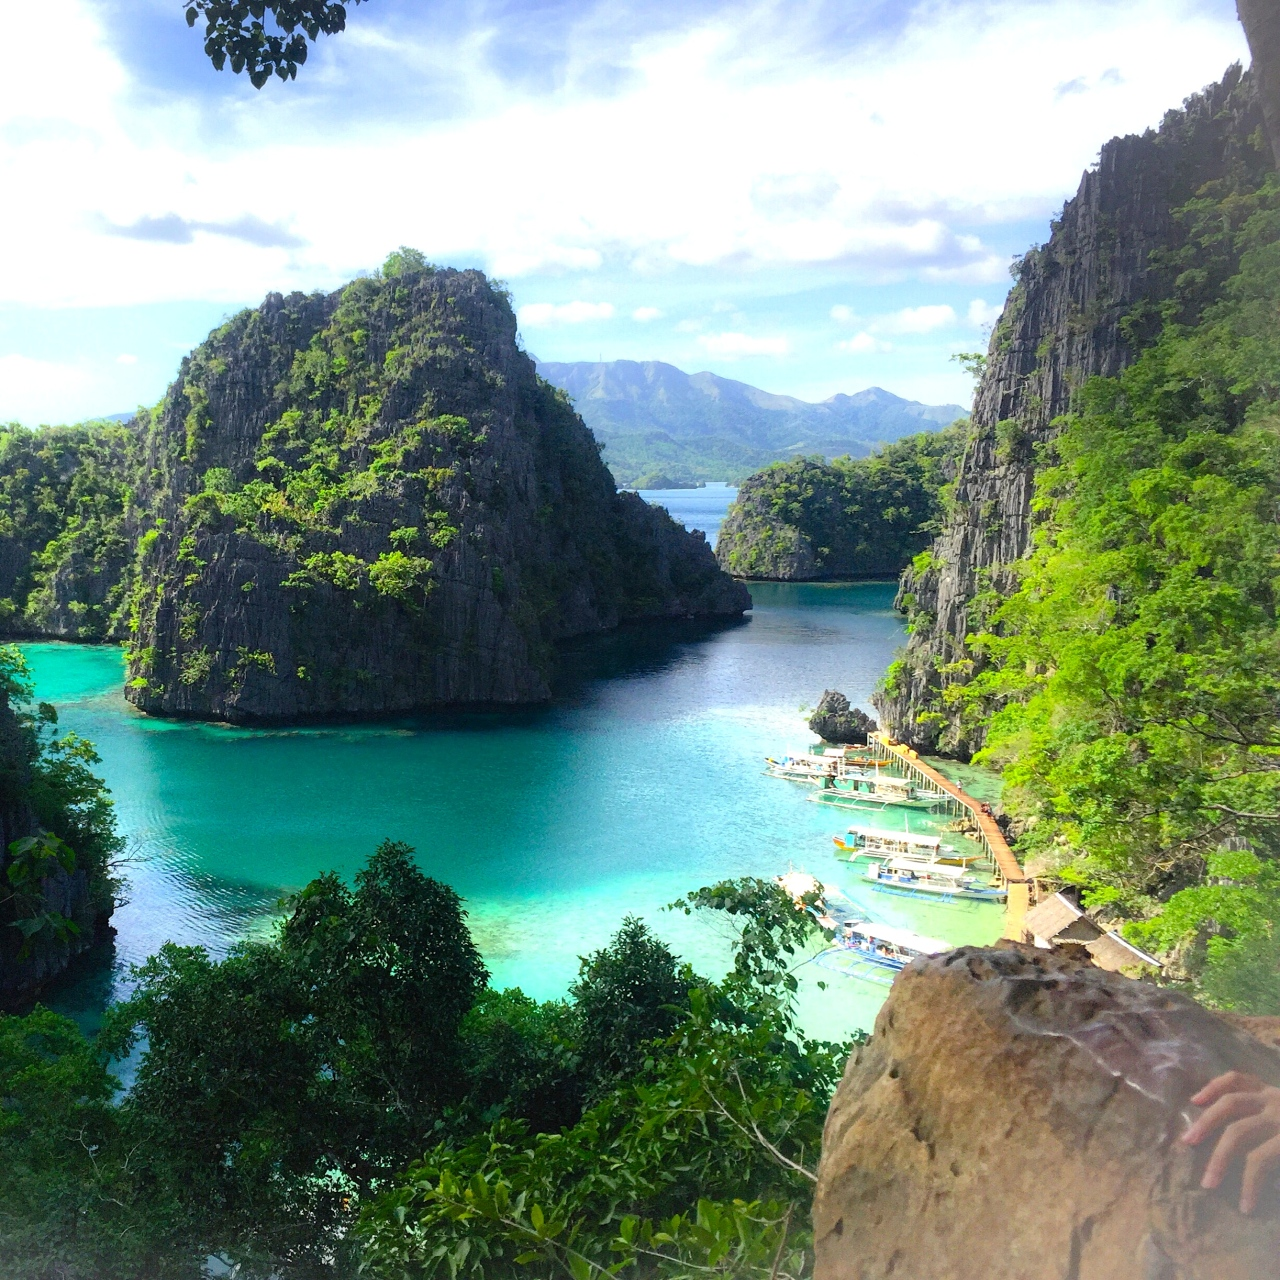 Coron: The best of Palawan's thousandtreasures